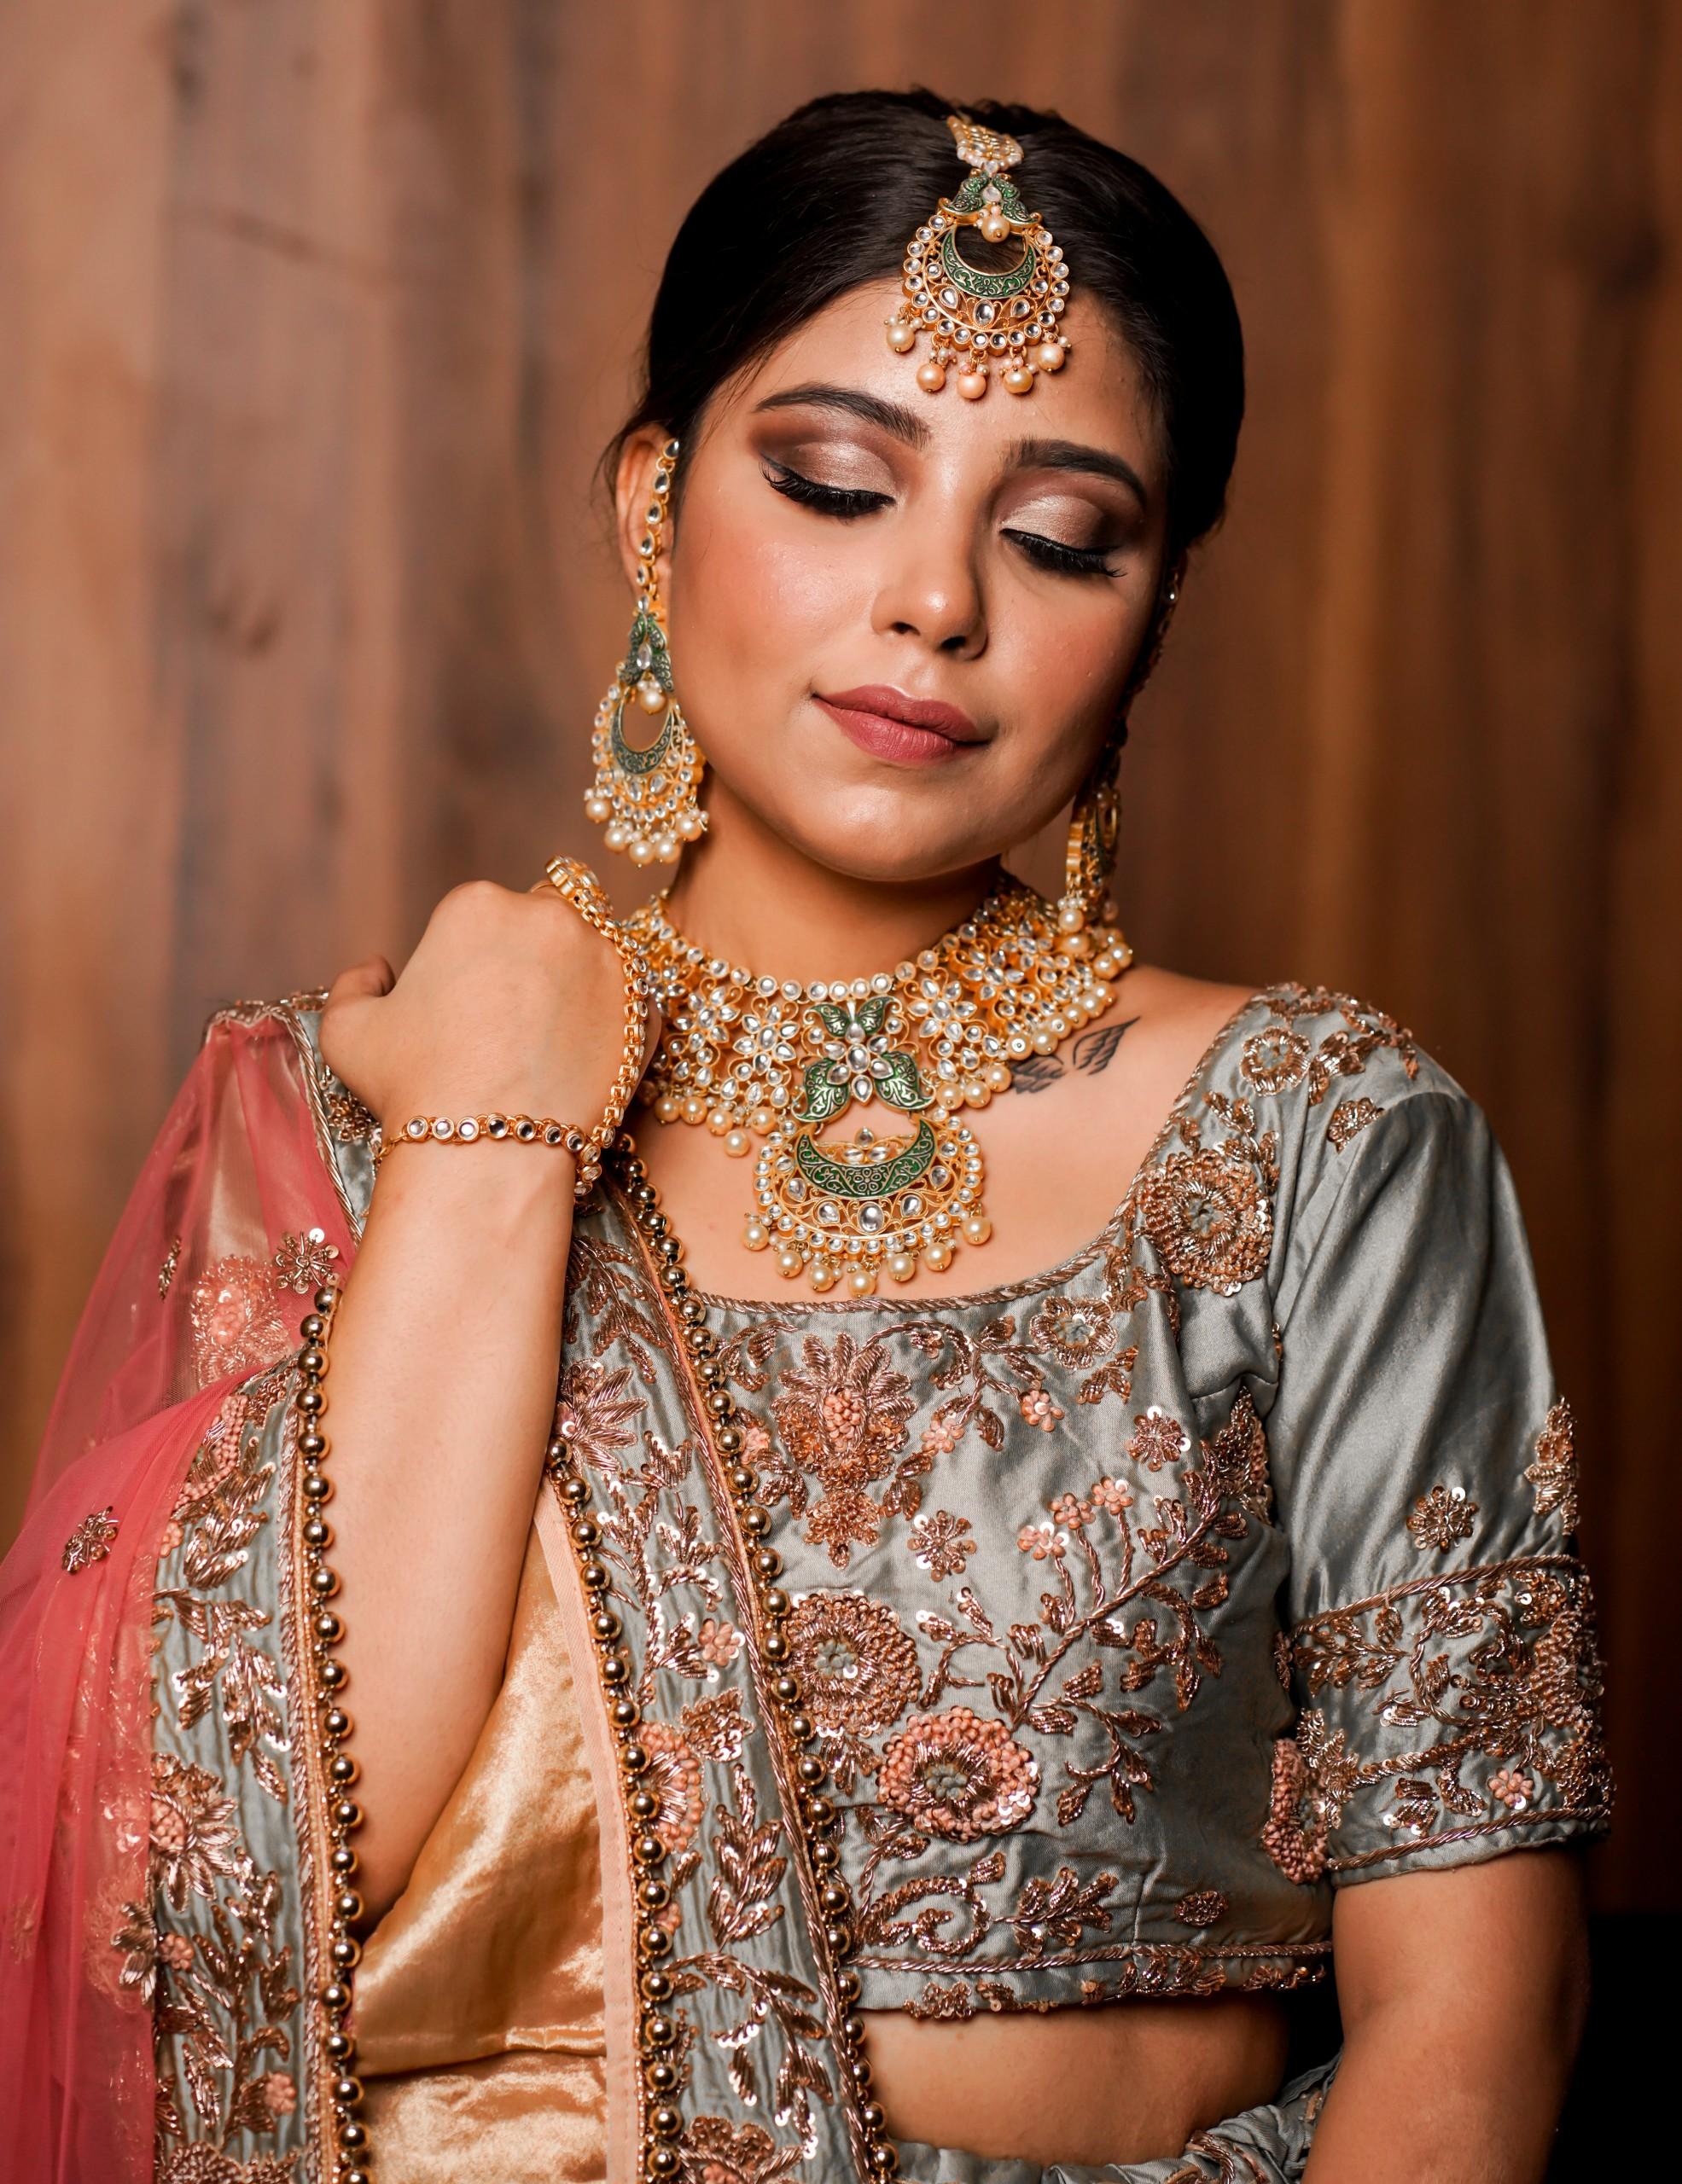 Indian bride's makeover